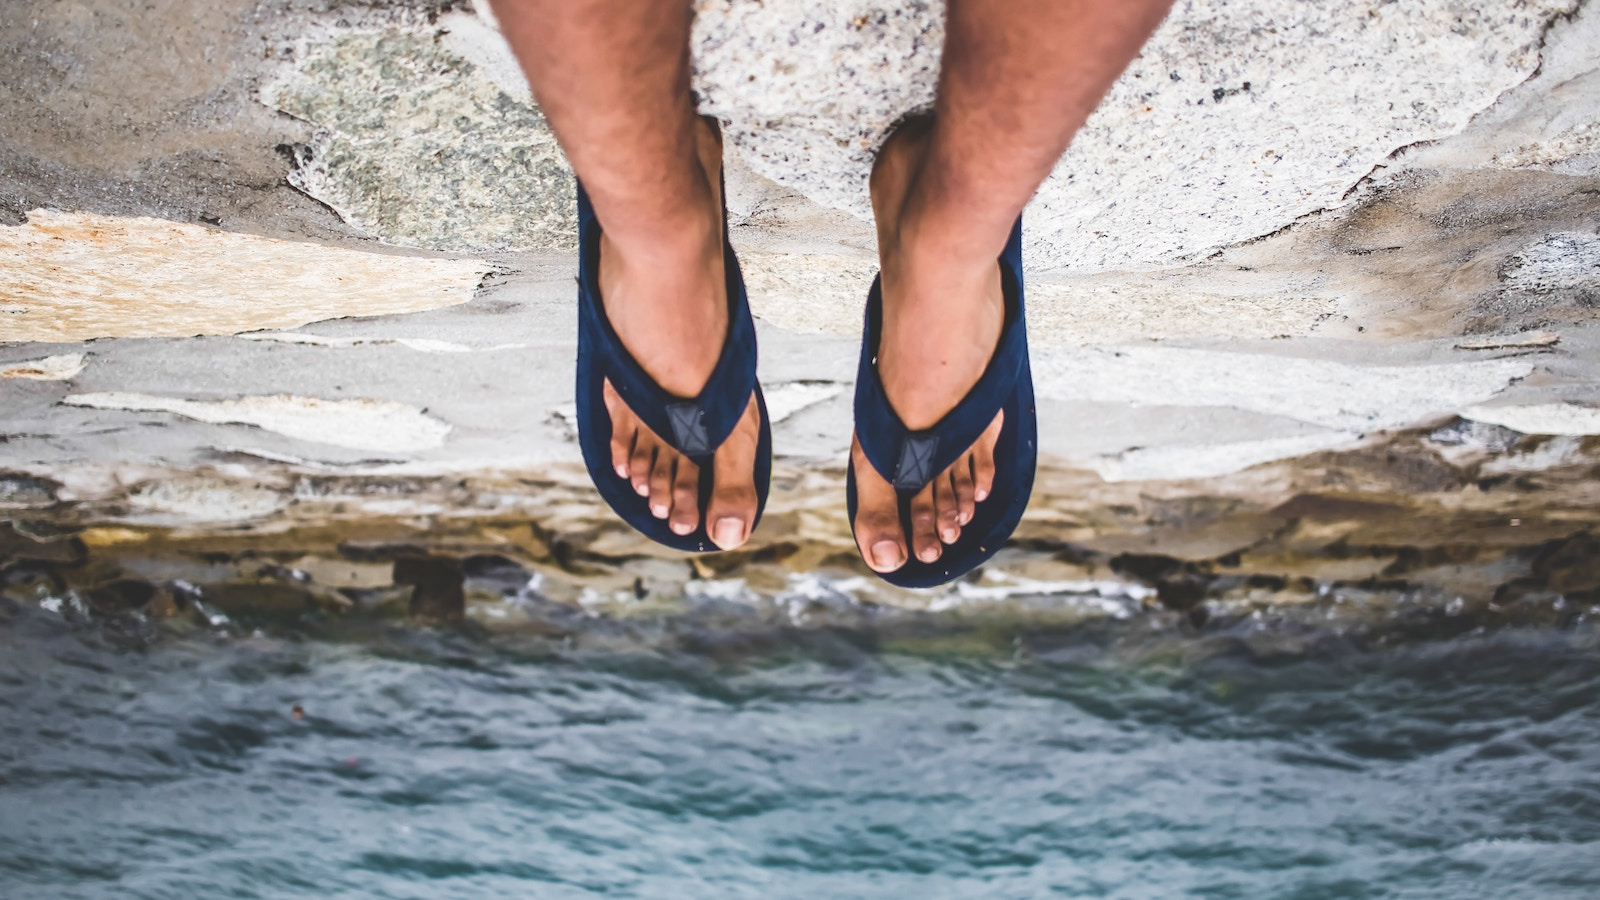 10 Best Men's Leather Flip Flops (Sandals)